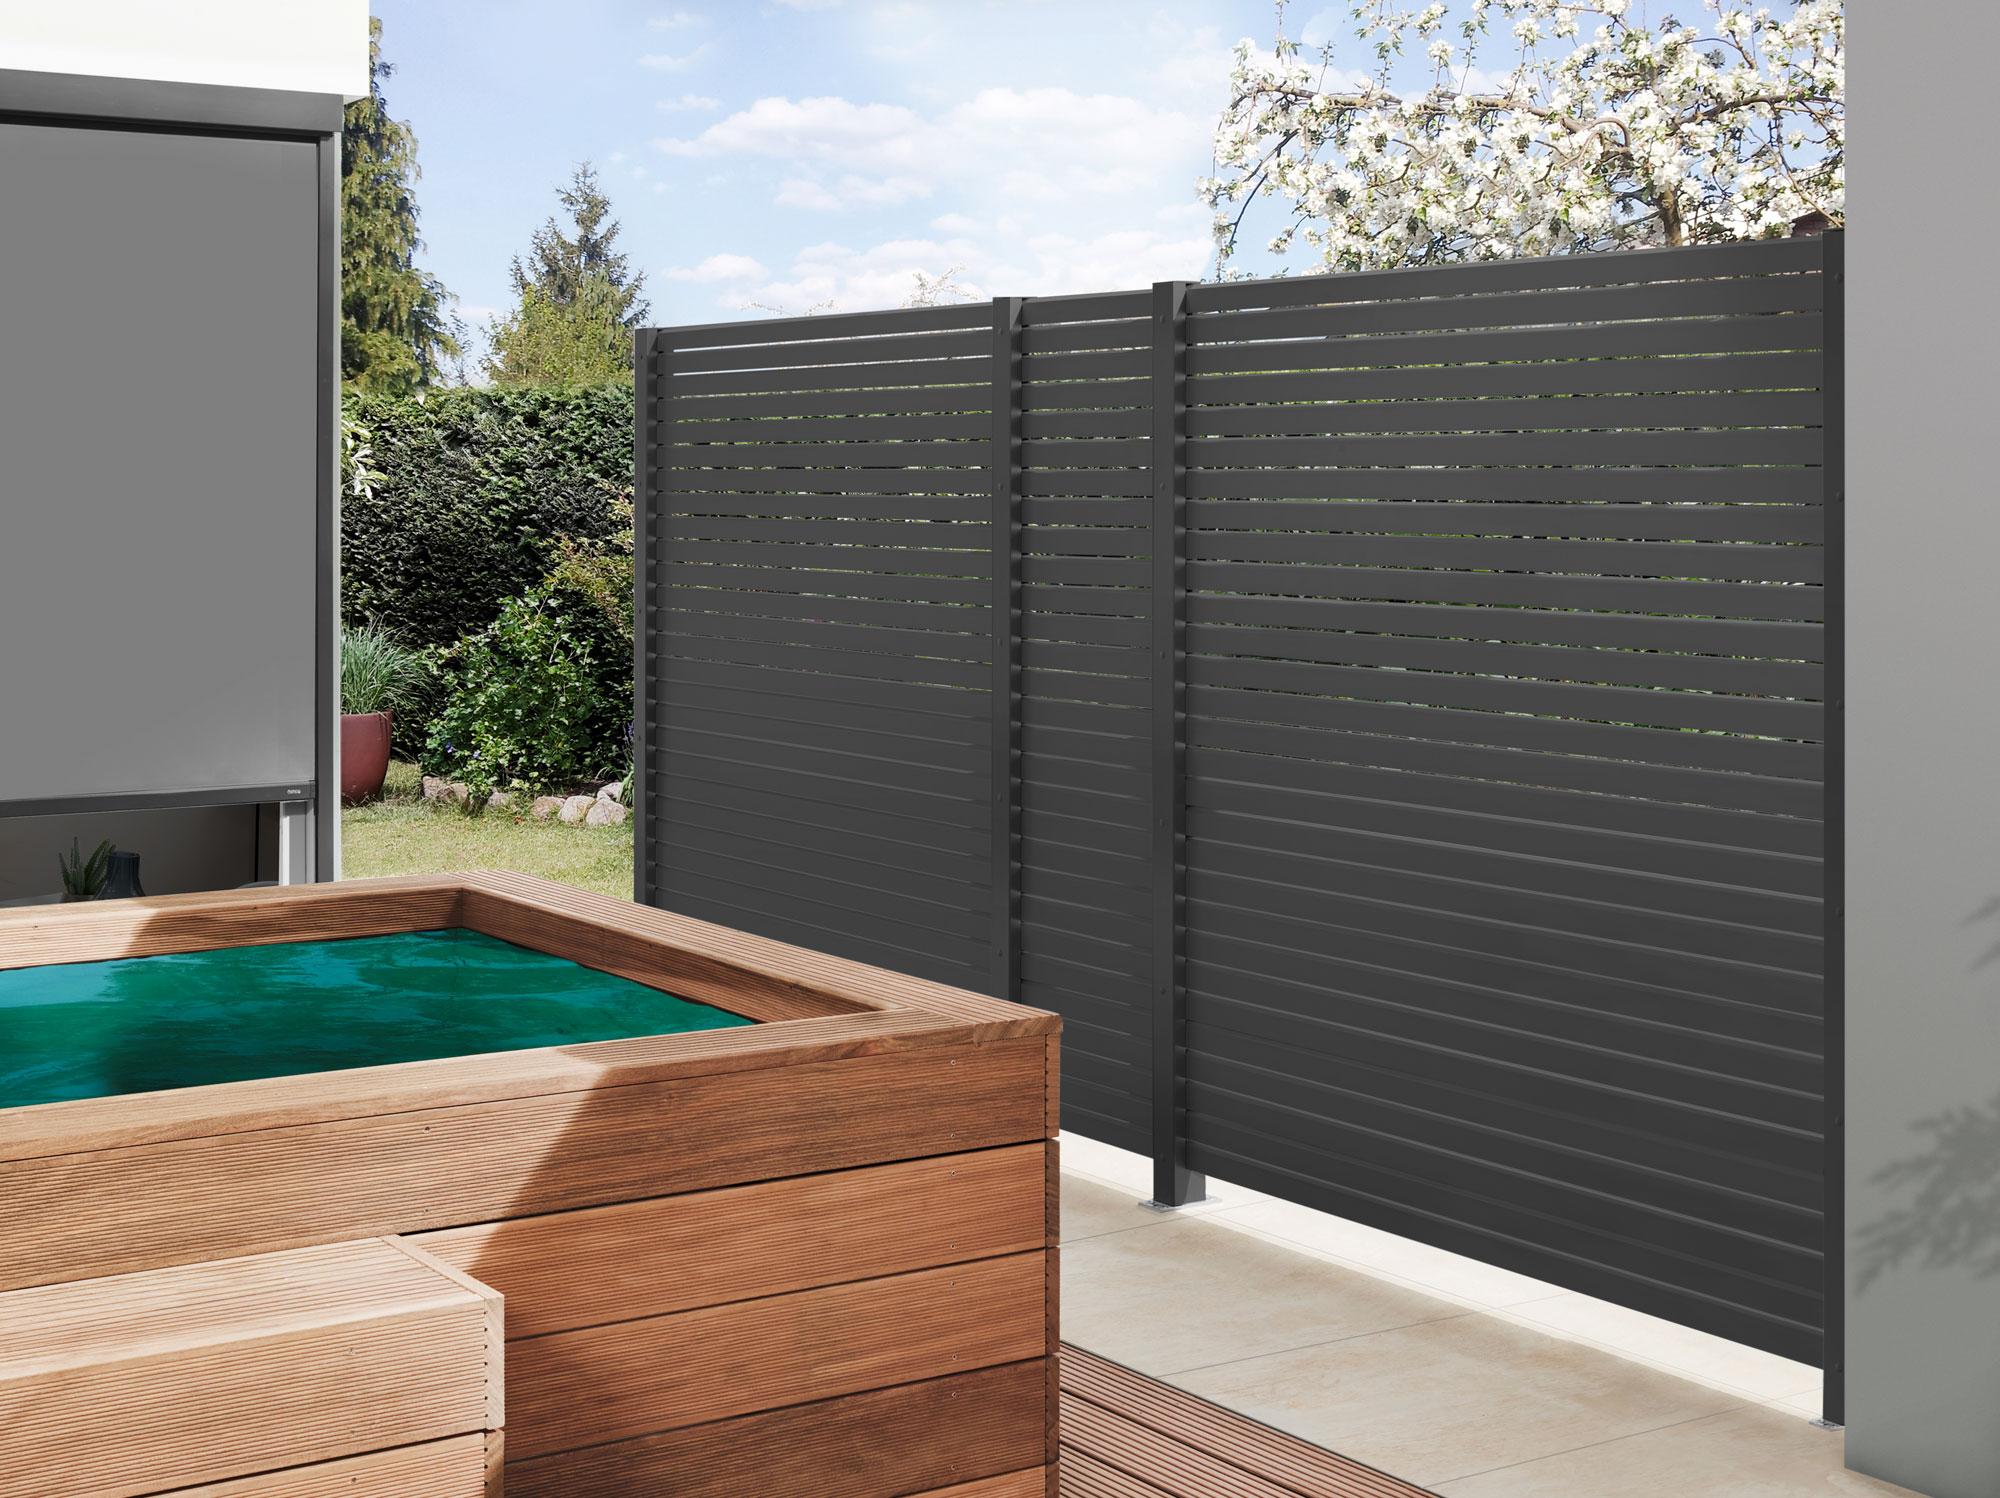 sichtschutzzaun system metall rhombus zaunfeld anthrazit b180xh180cm bei. Black Bedroom Furniture Sets. Home Design Ideas